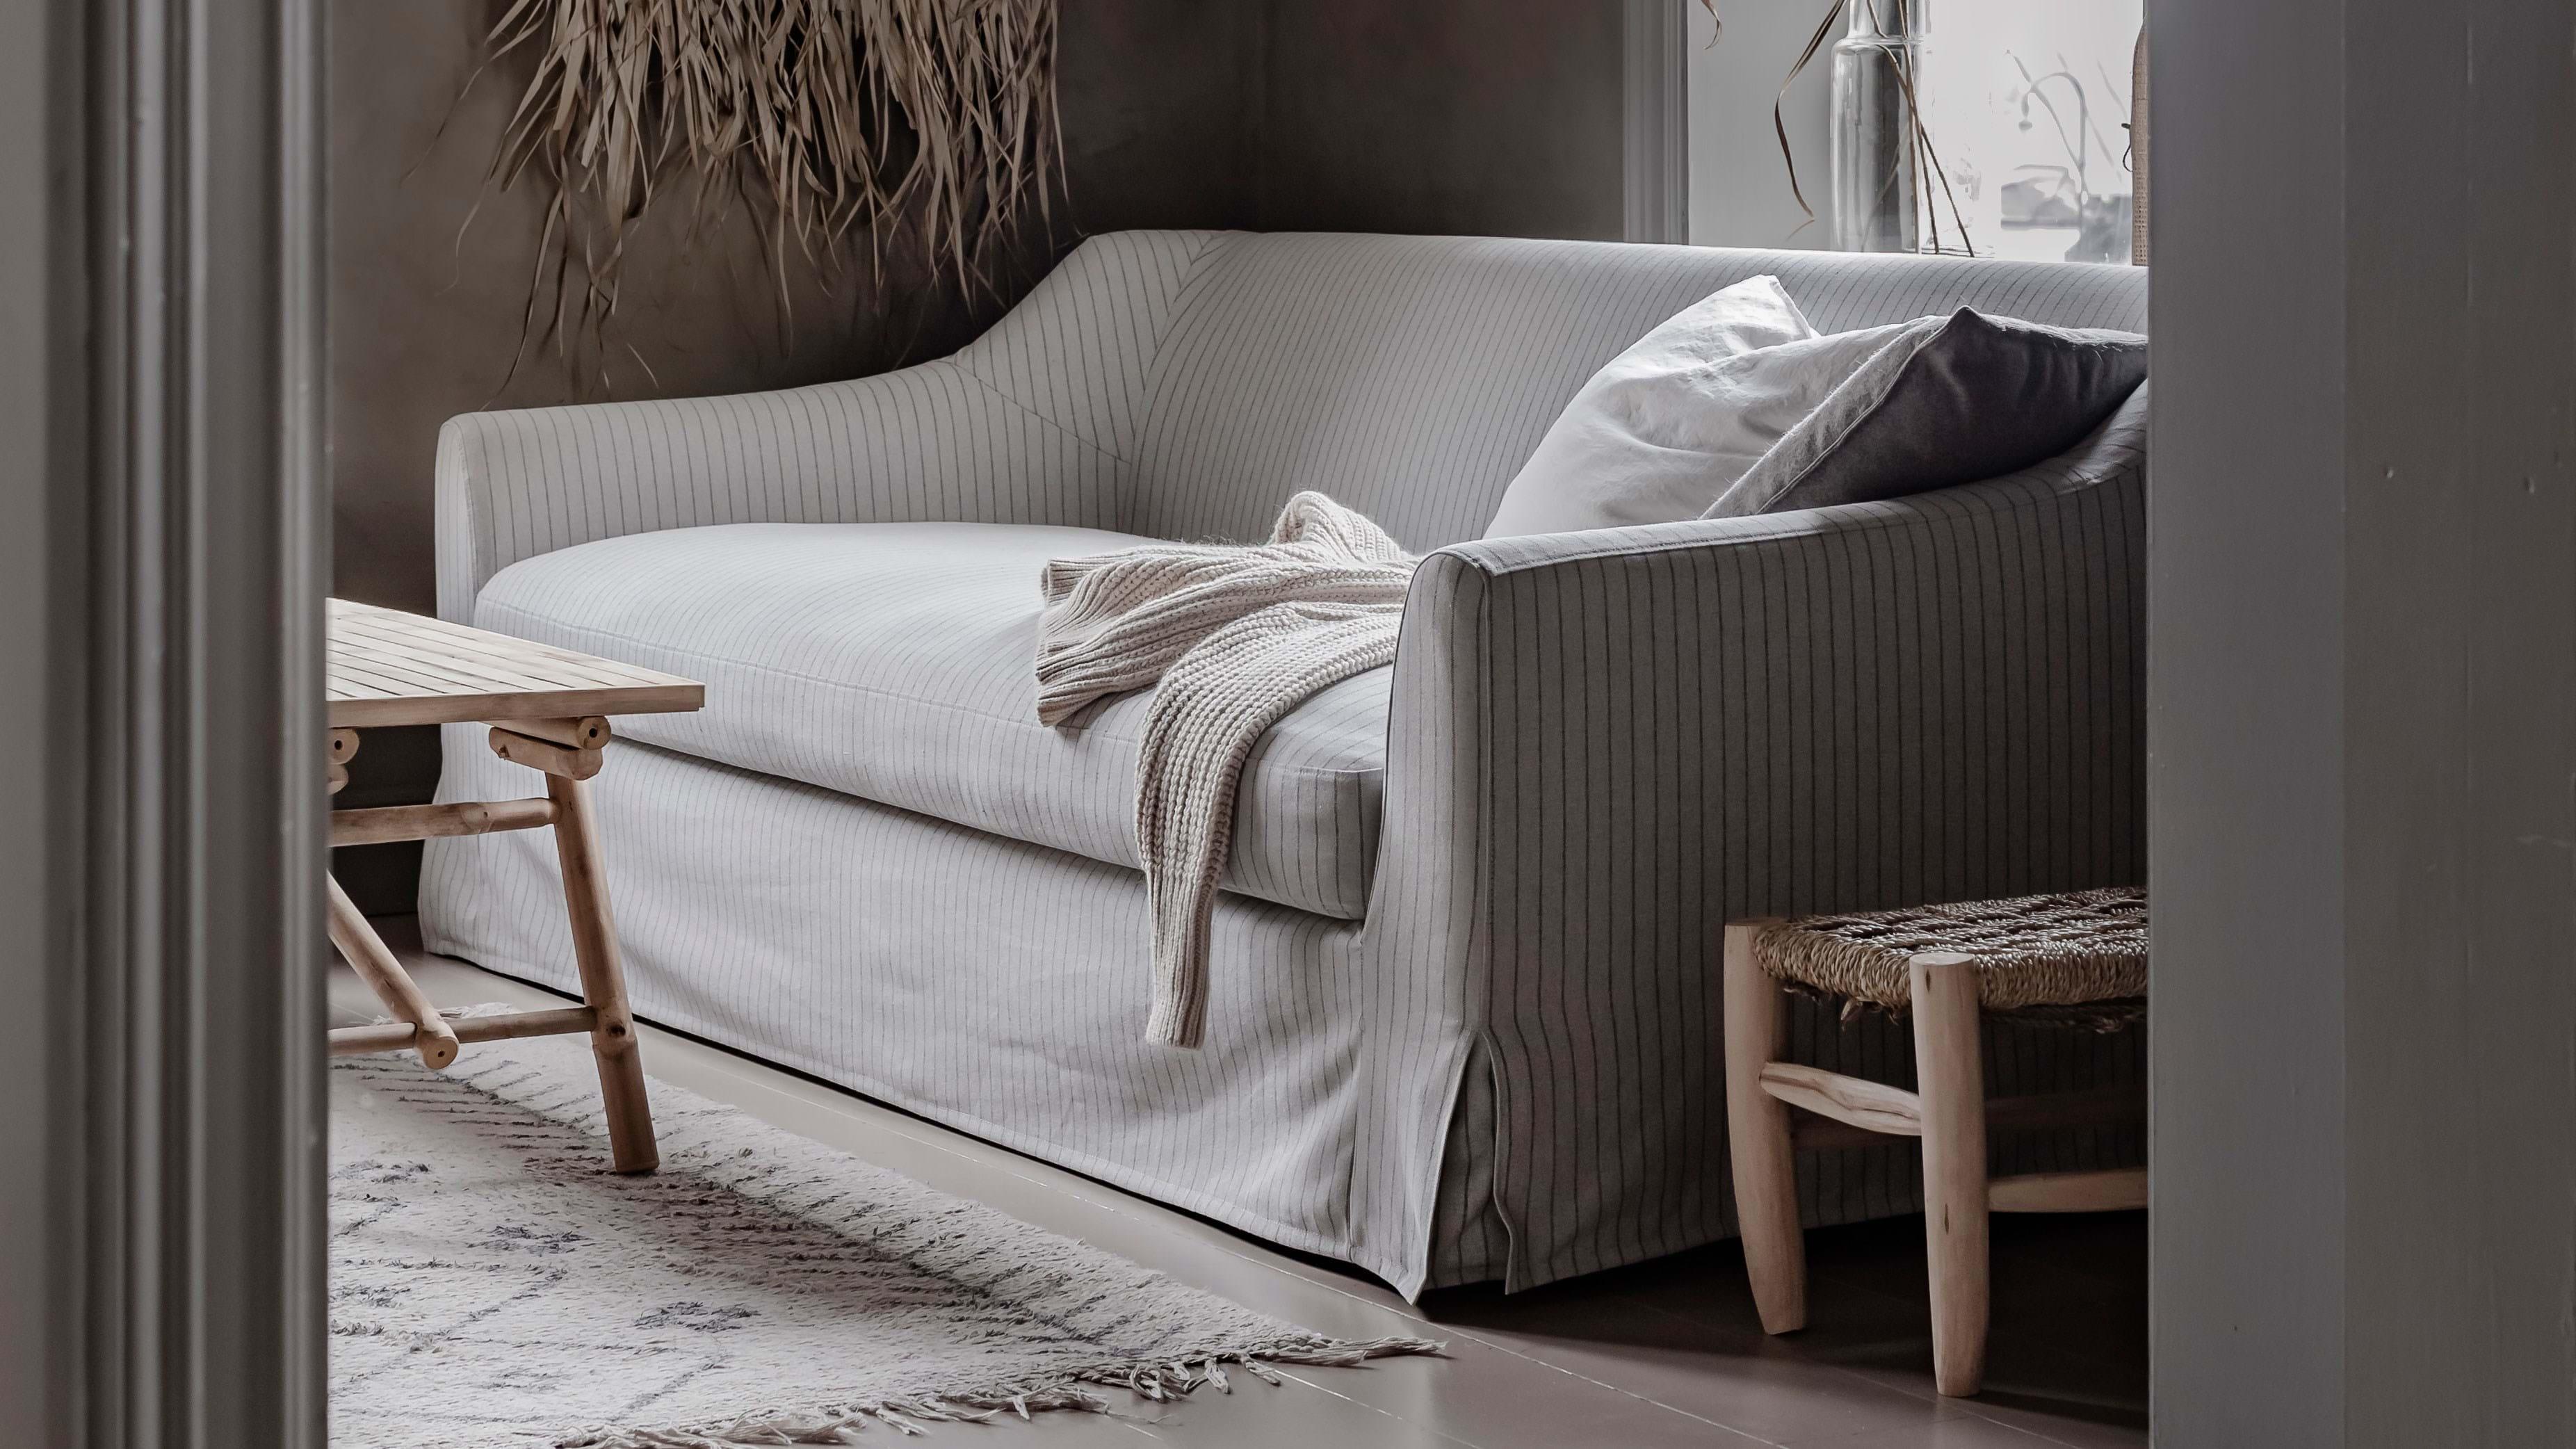 Ikea Färlöv Sofa Review By Bemz